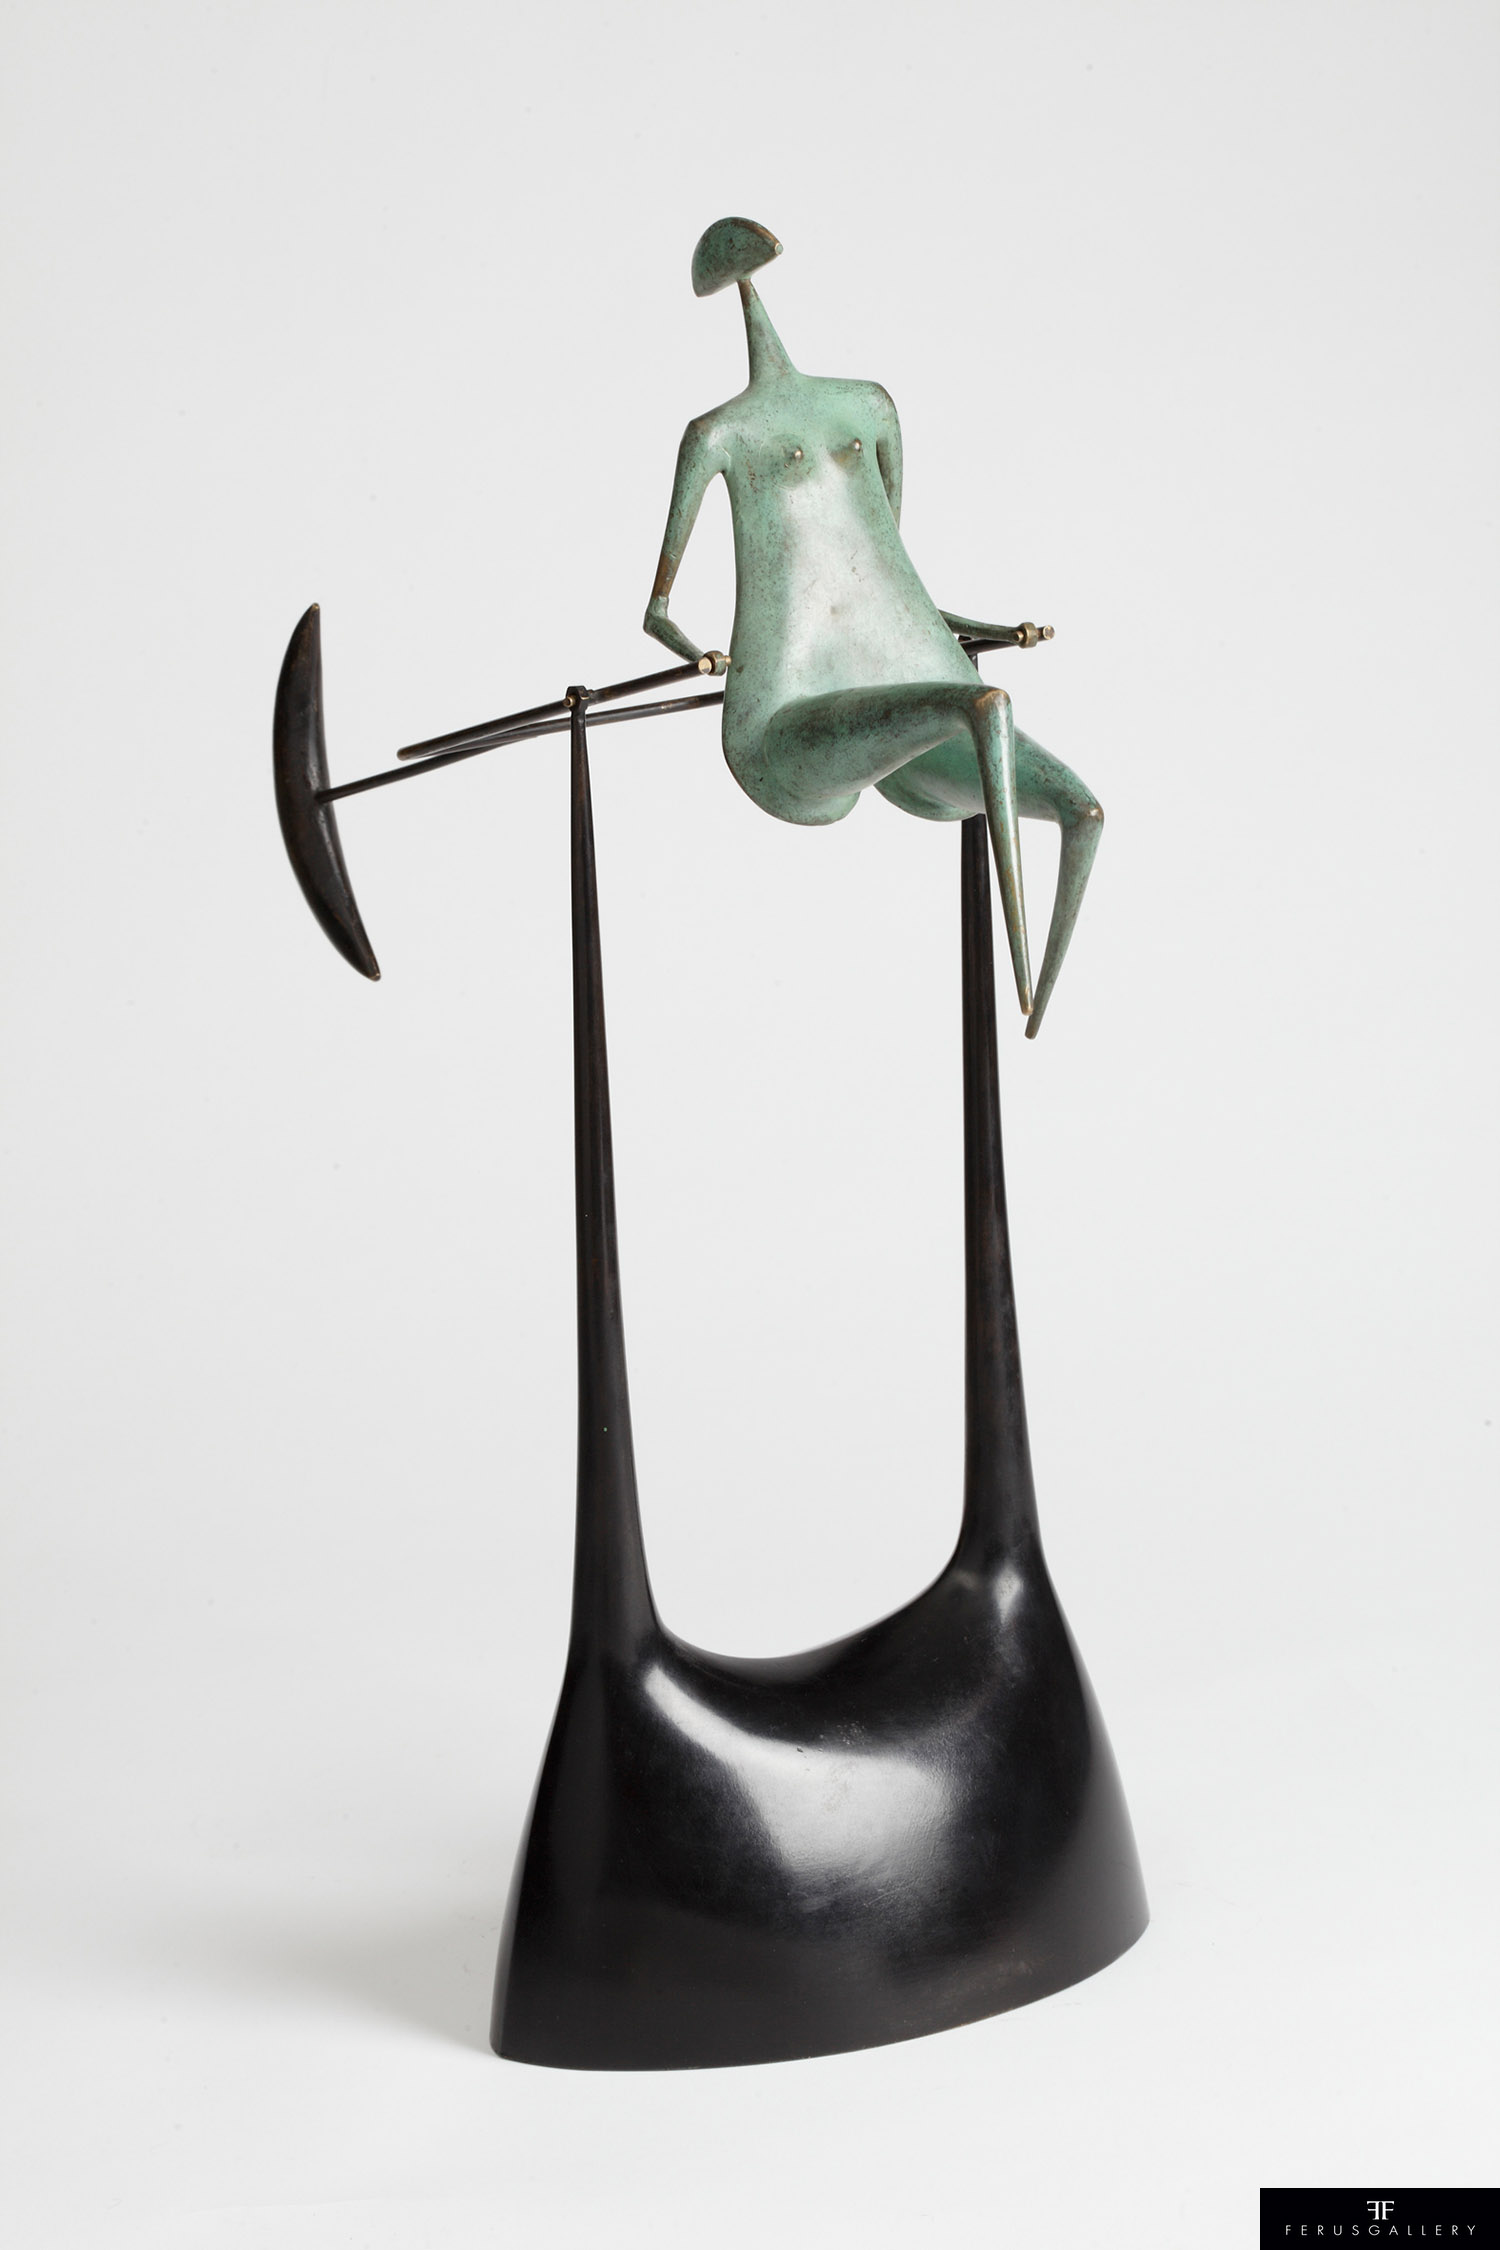 Petite Galipette de Philippe Hiquily